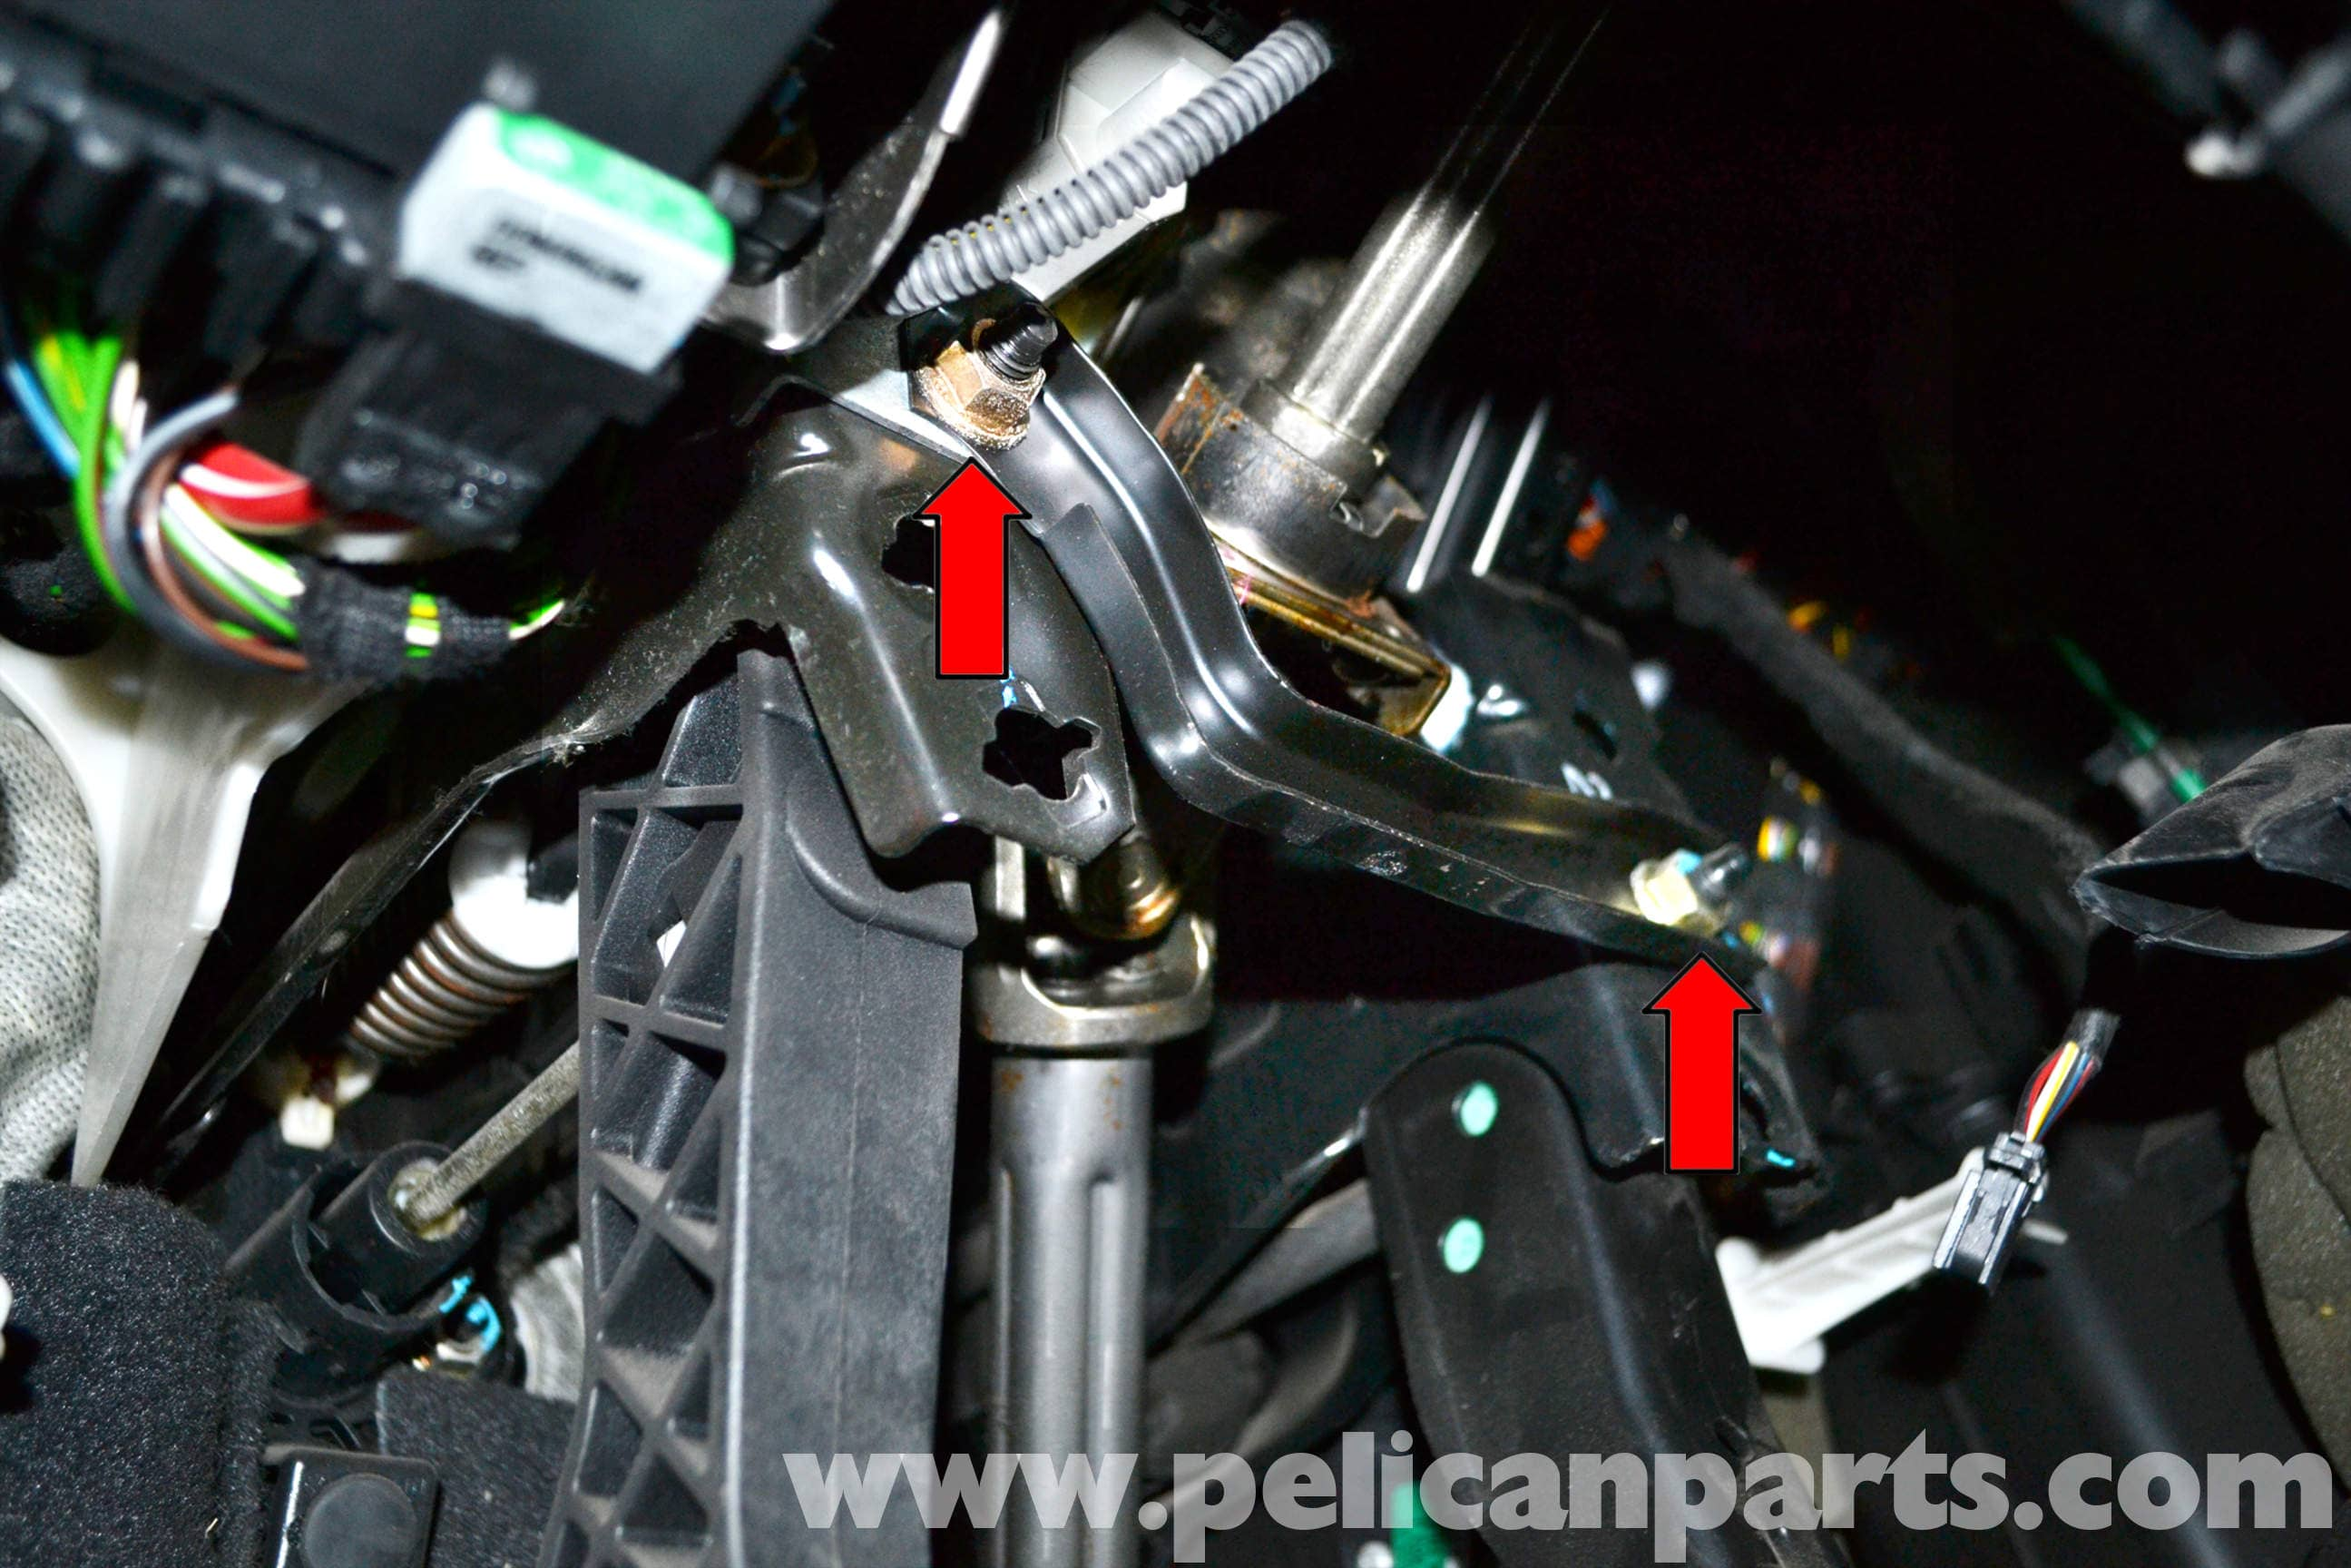 2003 Gti Headlight Wiring Diagram Volkswagen Golf Gti Mk V Brake Booster Replacement 2006